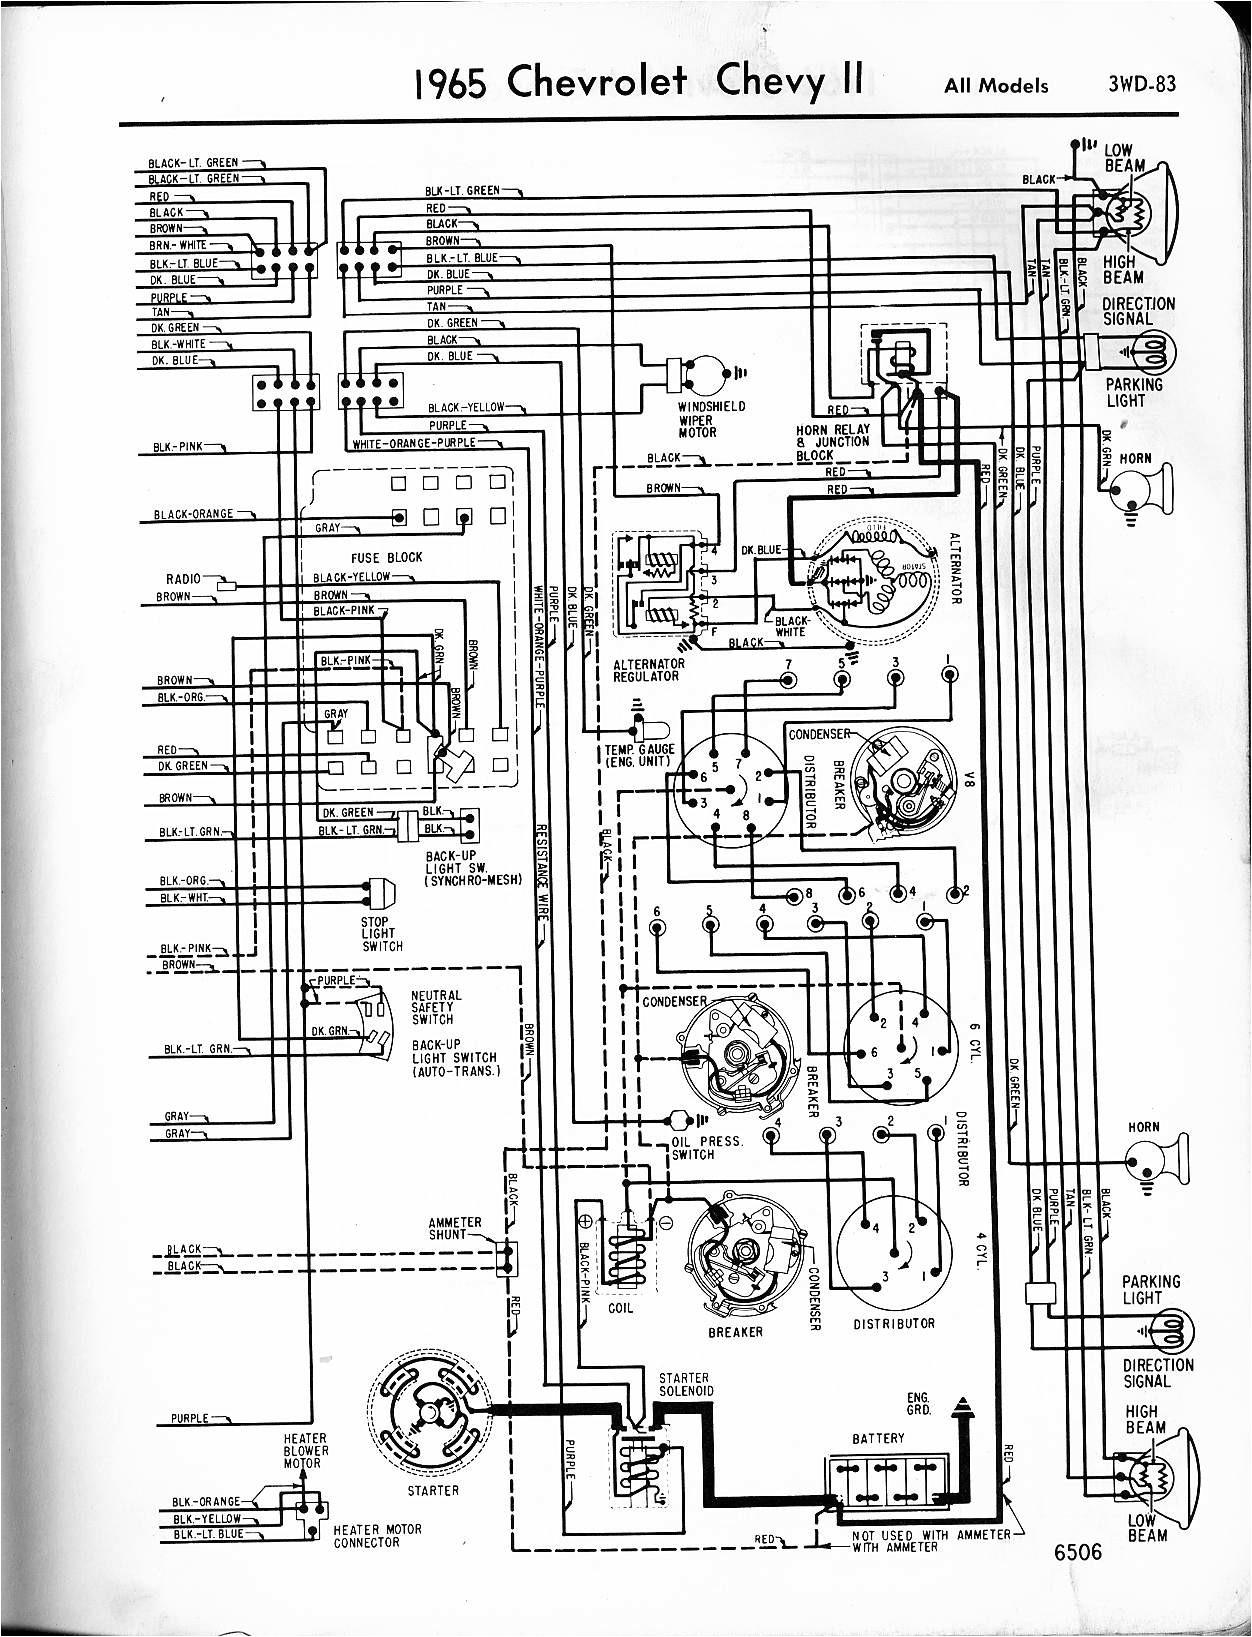 68 caprice wiring diagram schema diagram databasegm wiring schematic 1968 wiring diagram meta 68 caprice wiring